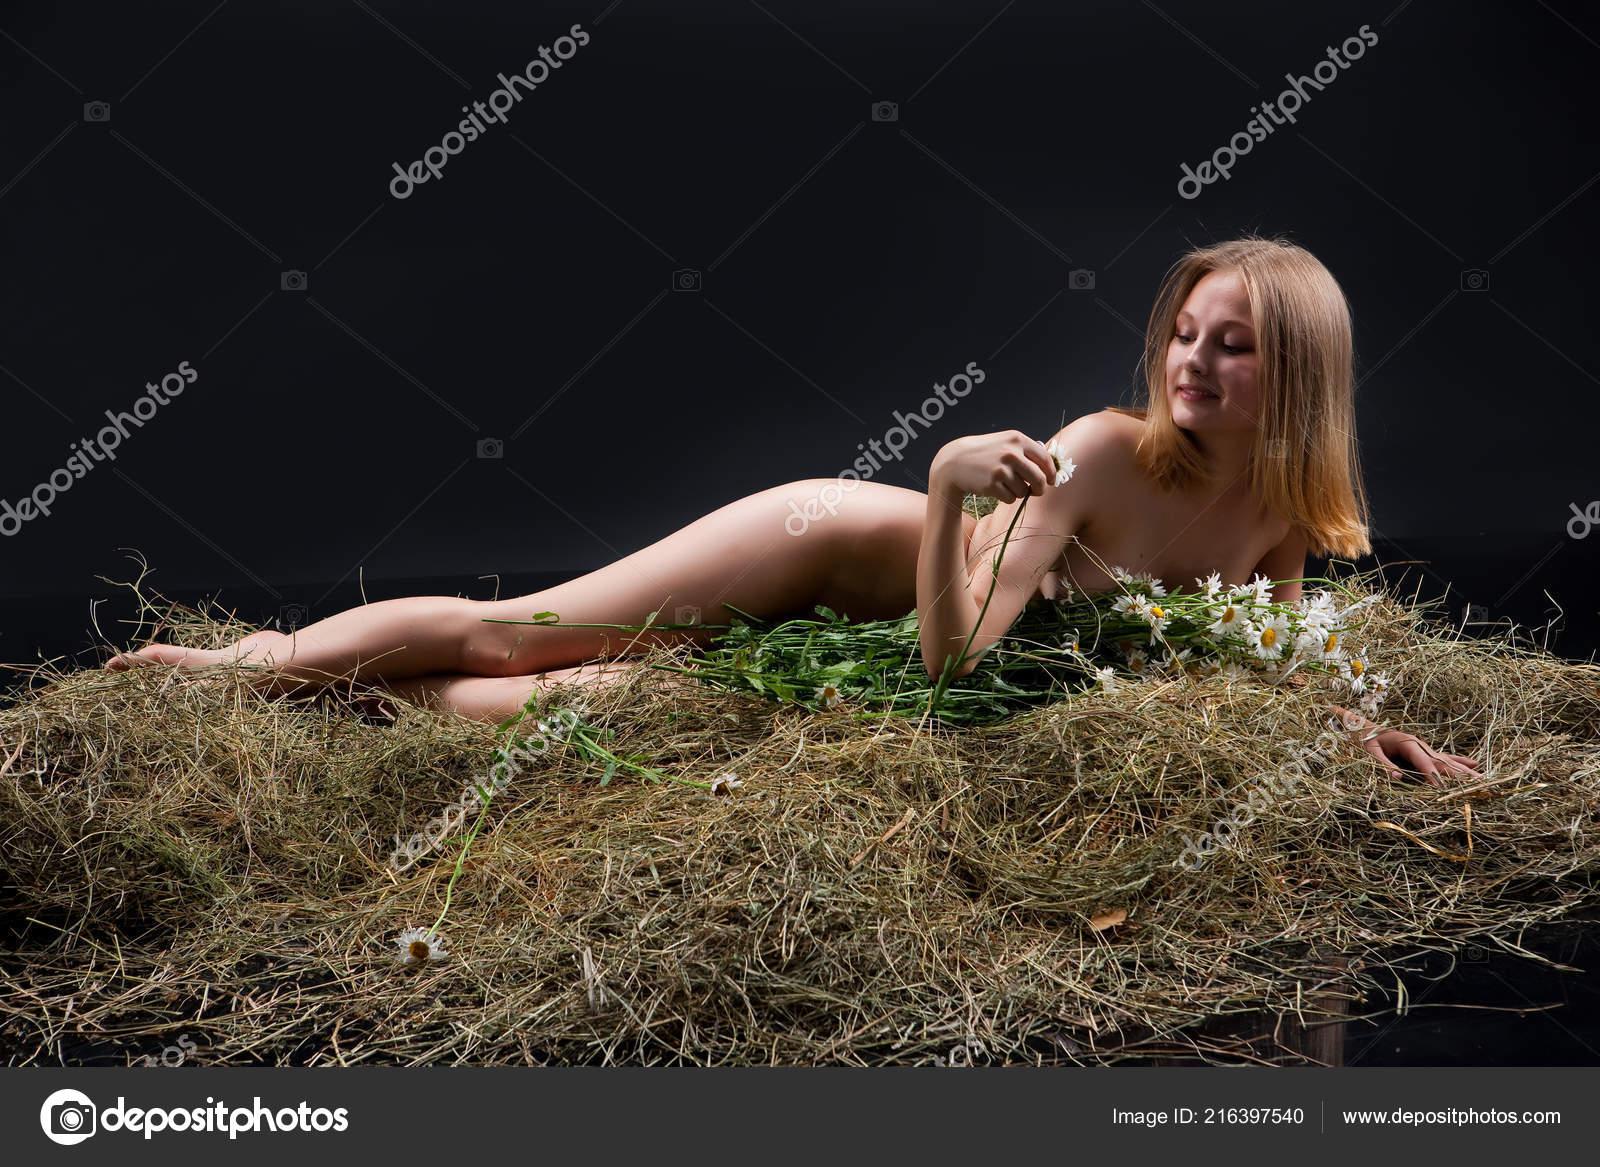 Hot women in the nude